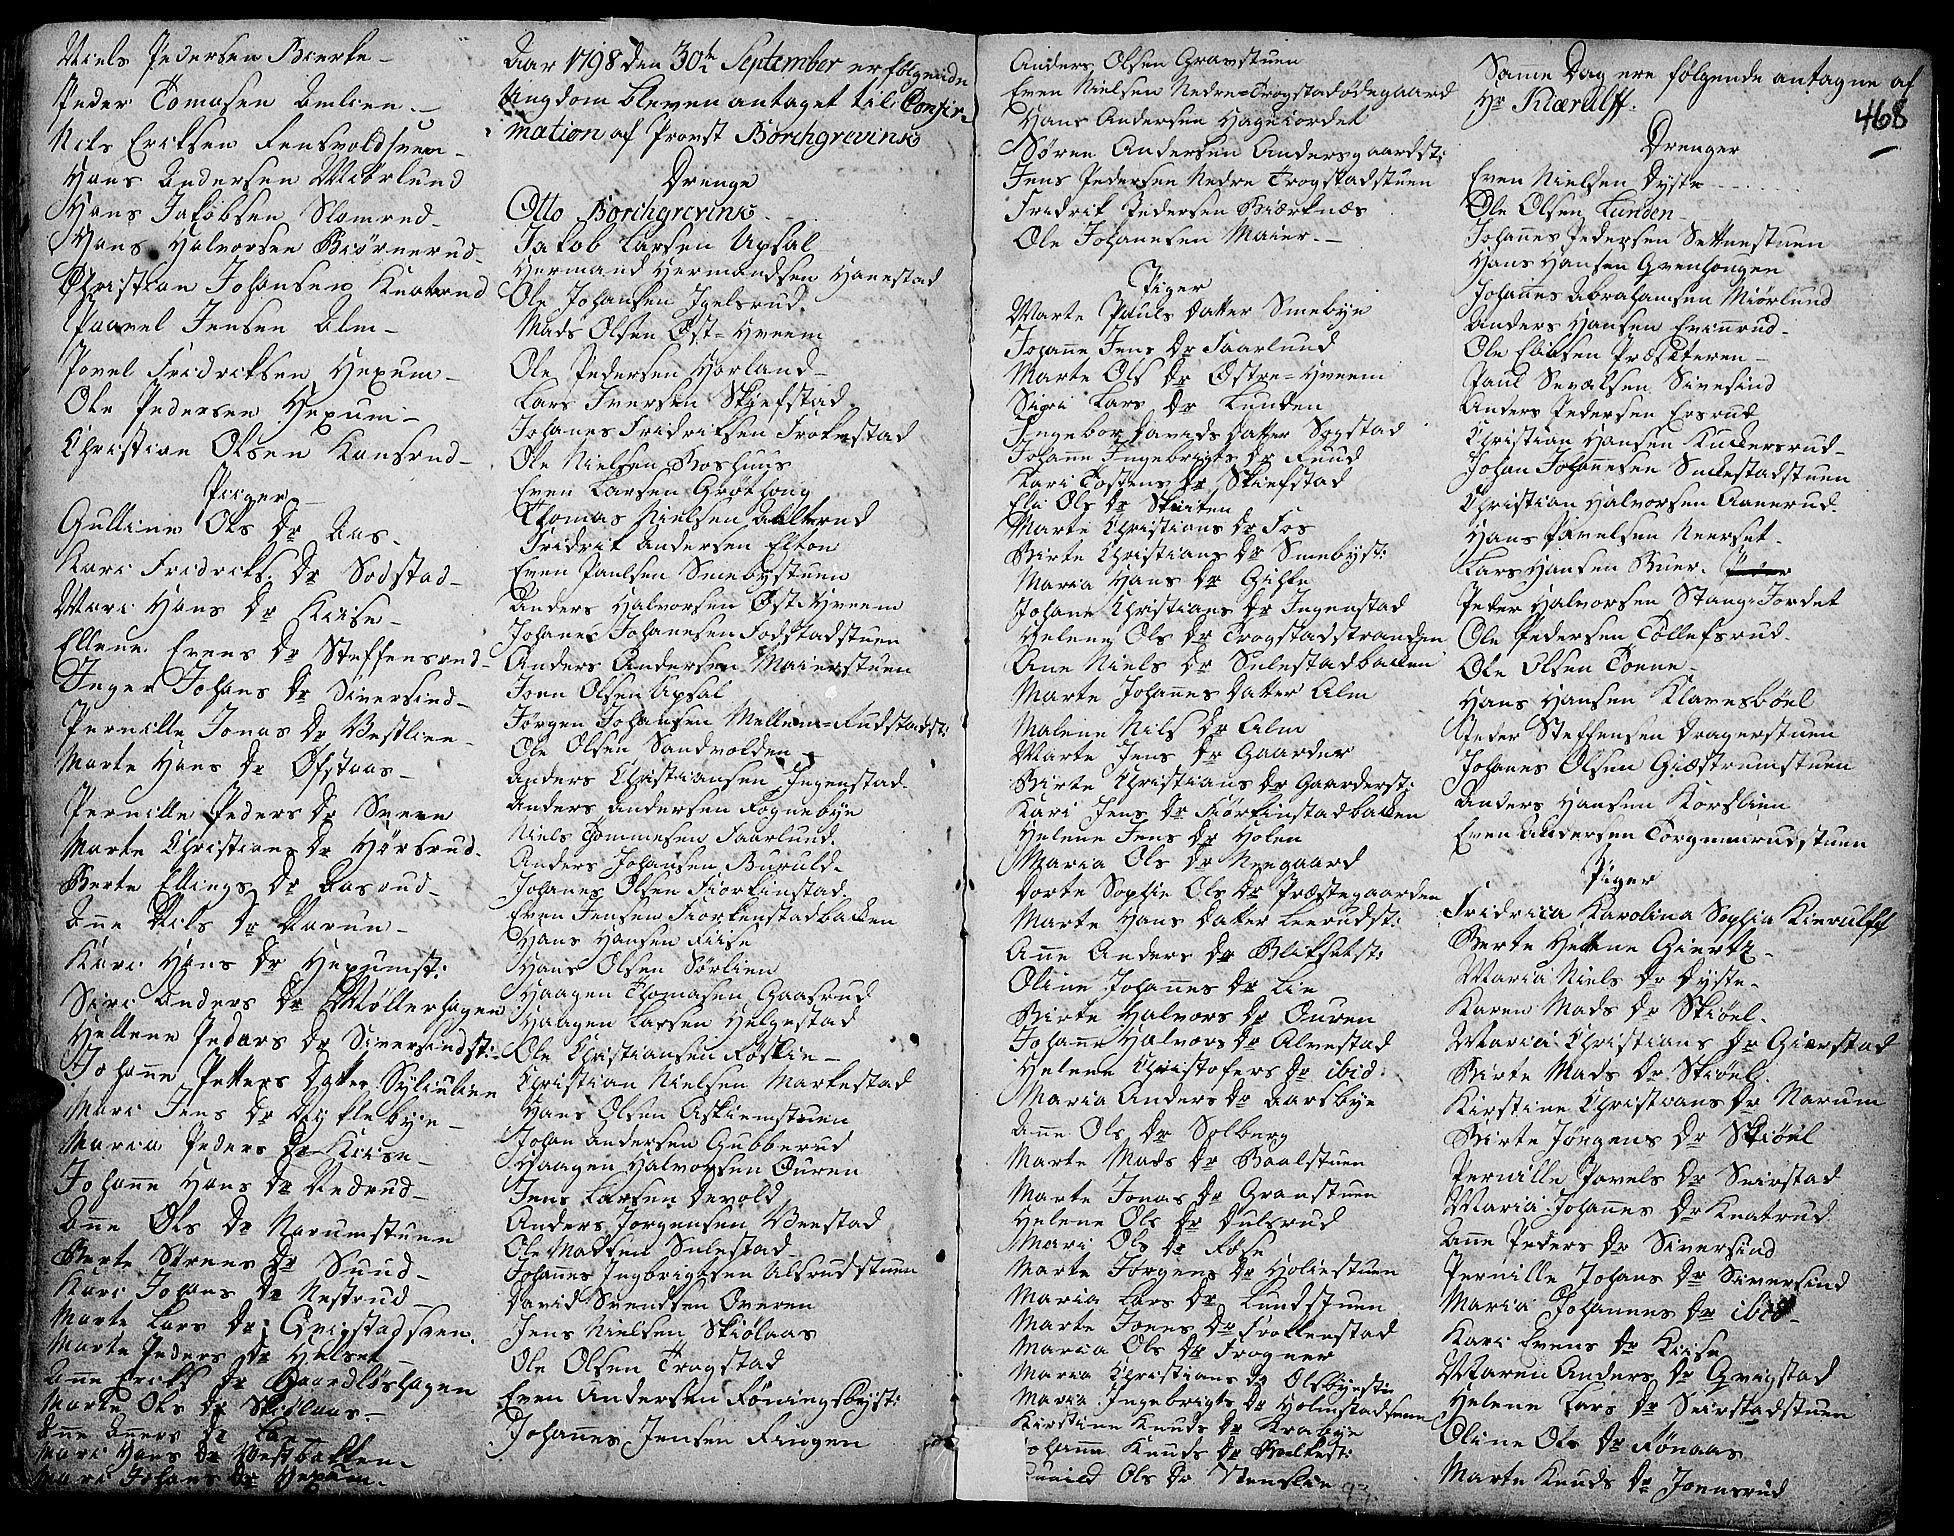 SAH, Toten prestekontor, Ministerialbok nr. 7, 1794-1809, s. 468